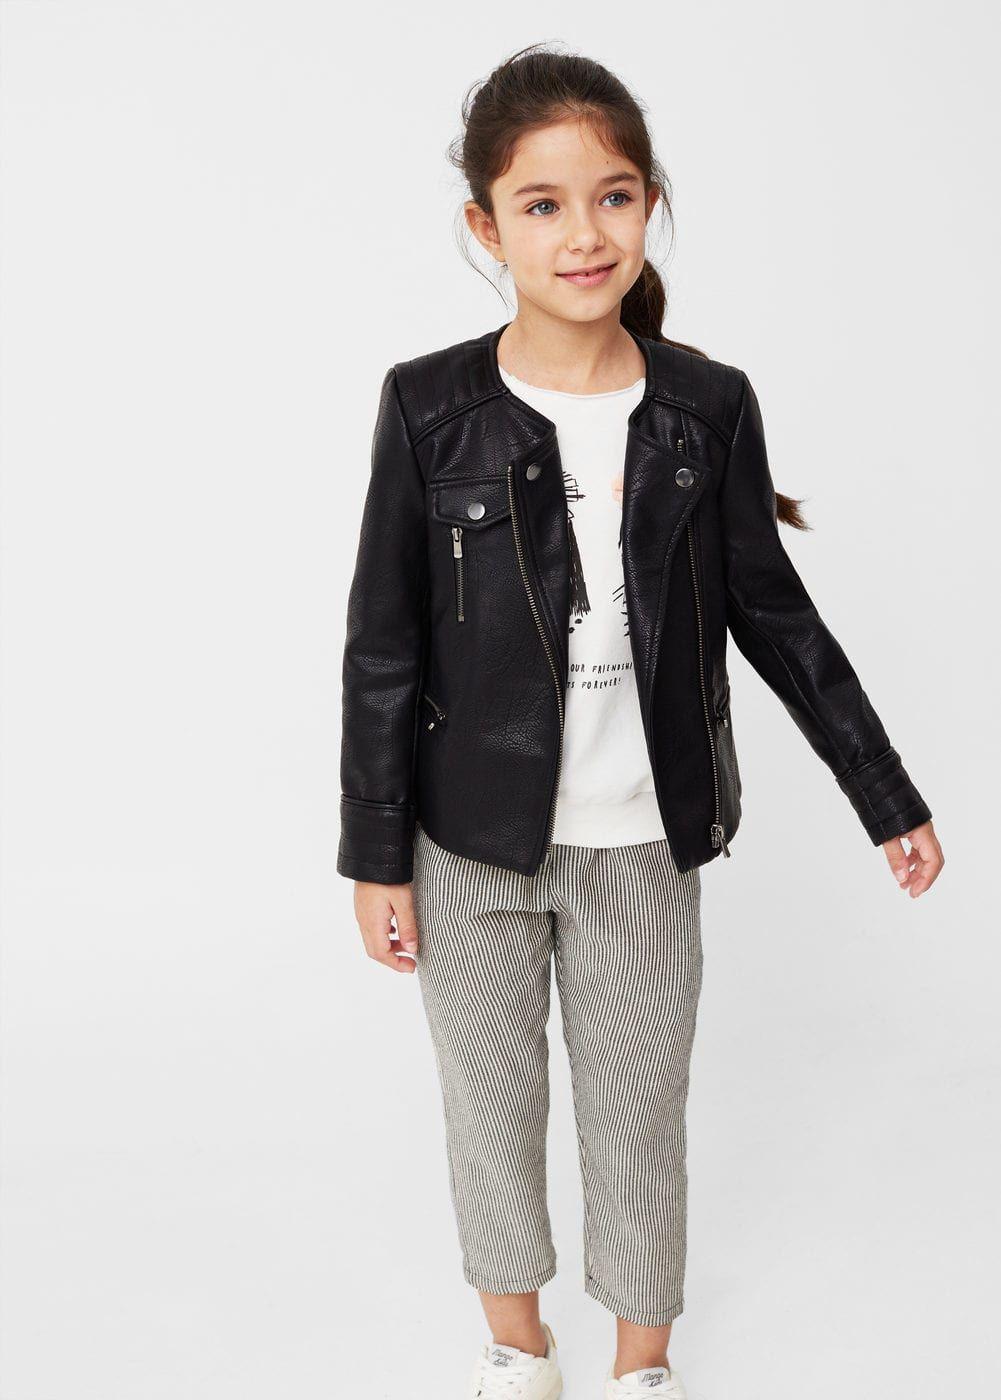 Zipped Biker Jacket Girls Mango Kids Usa Anak Perempuan Perempuan Anak [ 1400 x 1001 Pixel ]